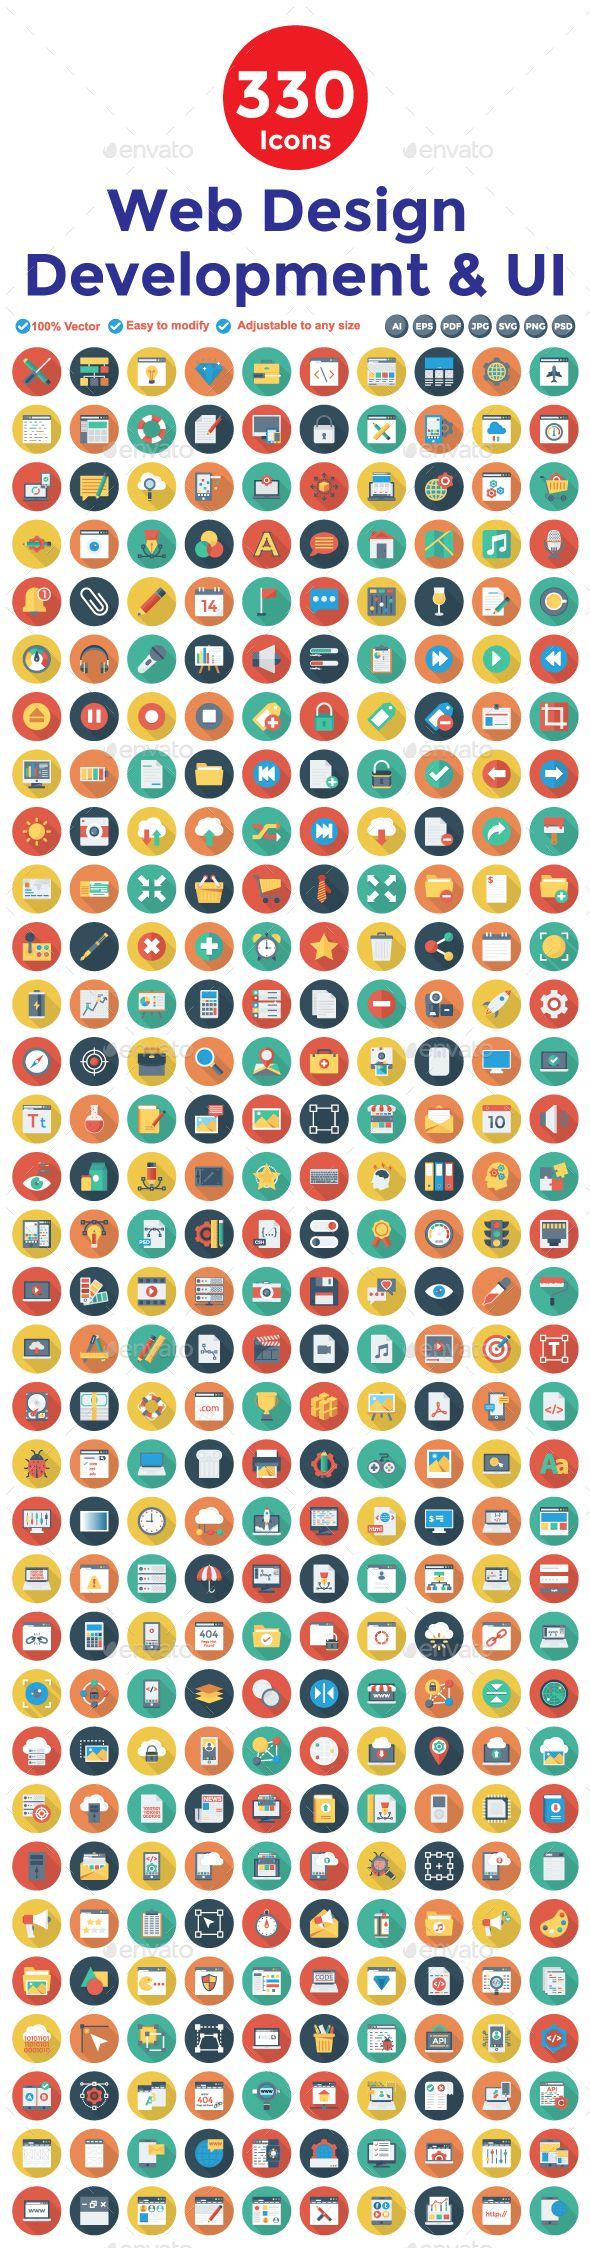 360 Flat Circle Shadow Web Design Developemnt & UI Icons